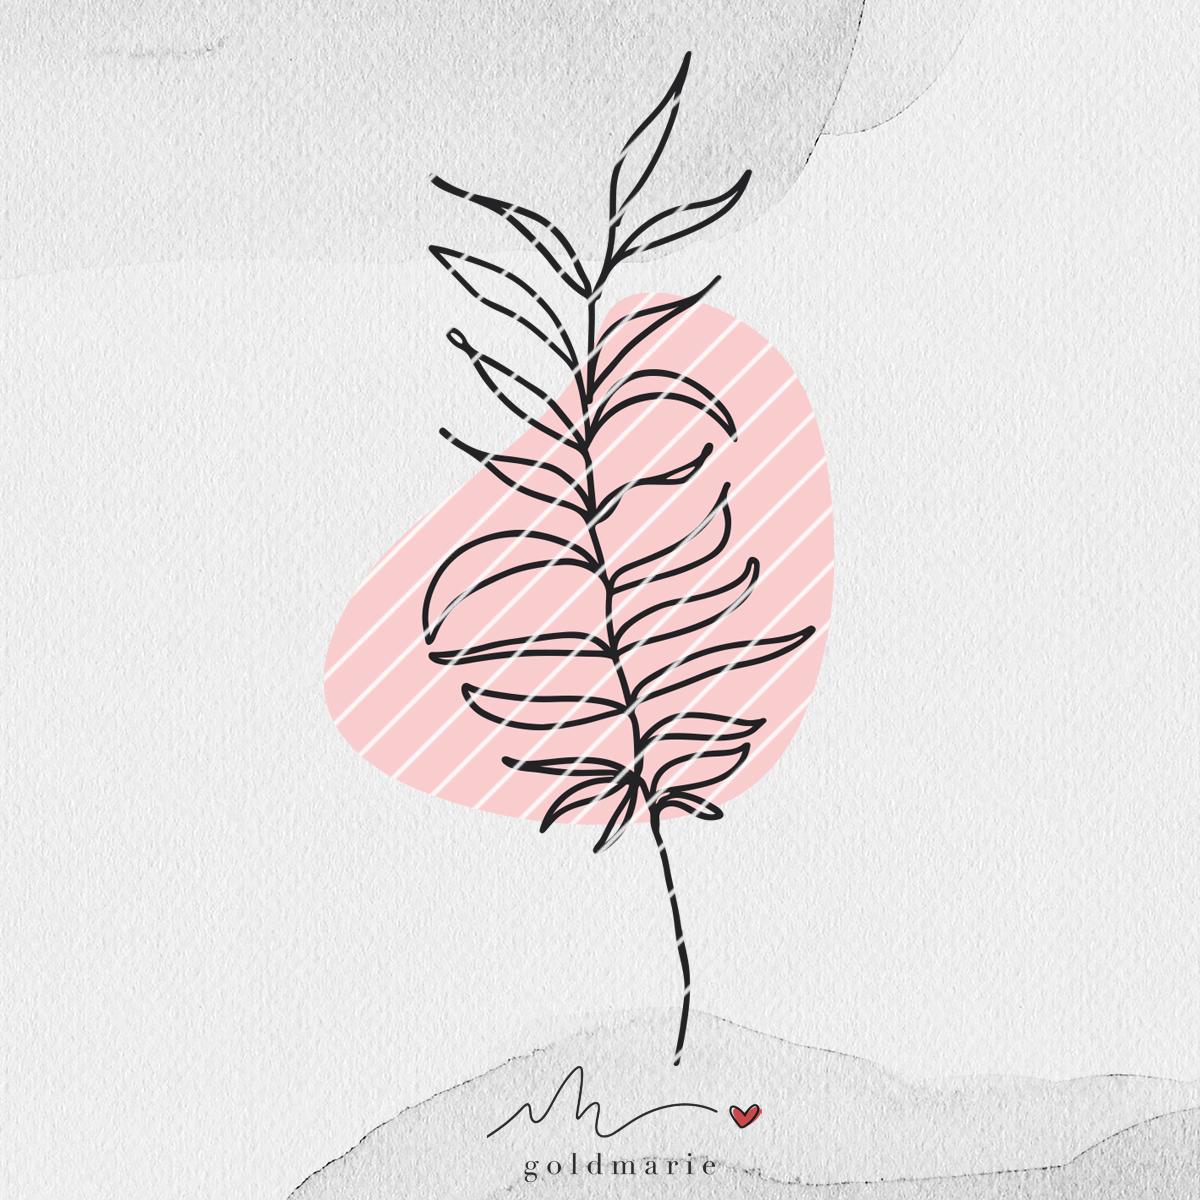 GOLDMARIE Plotterdatei - One Line Florals Tropic